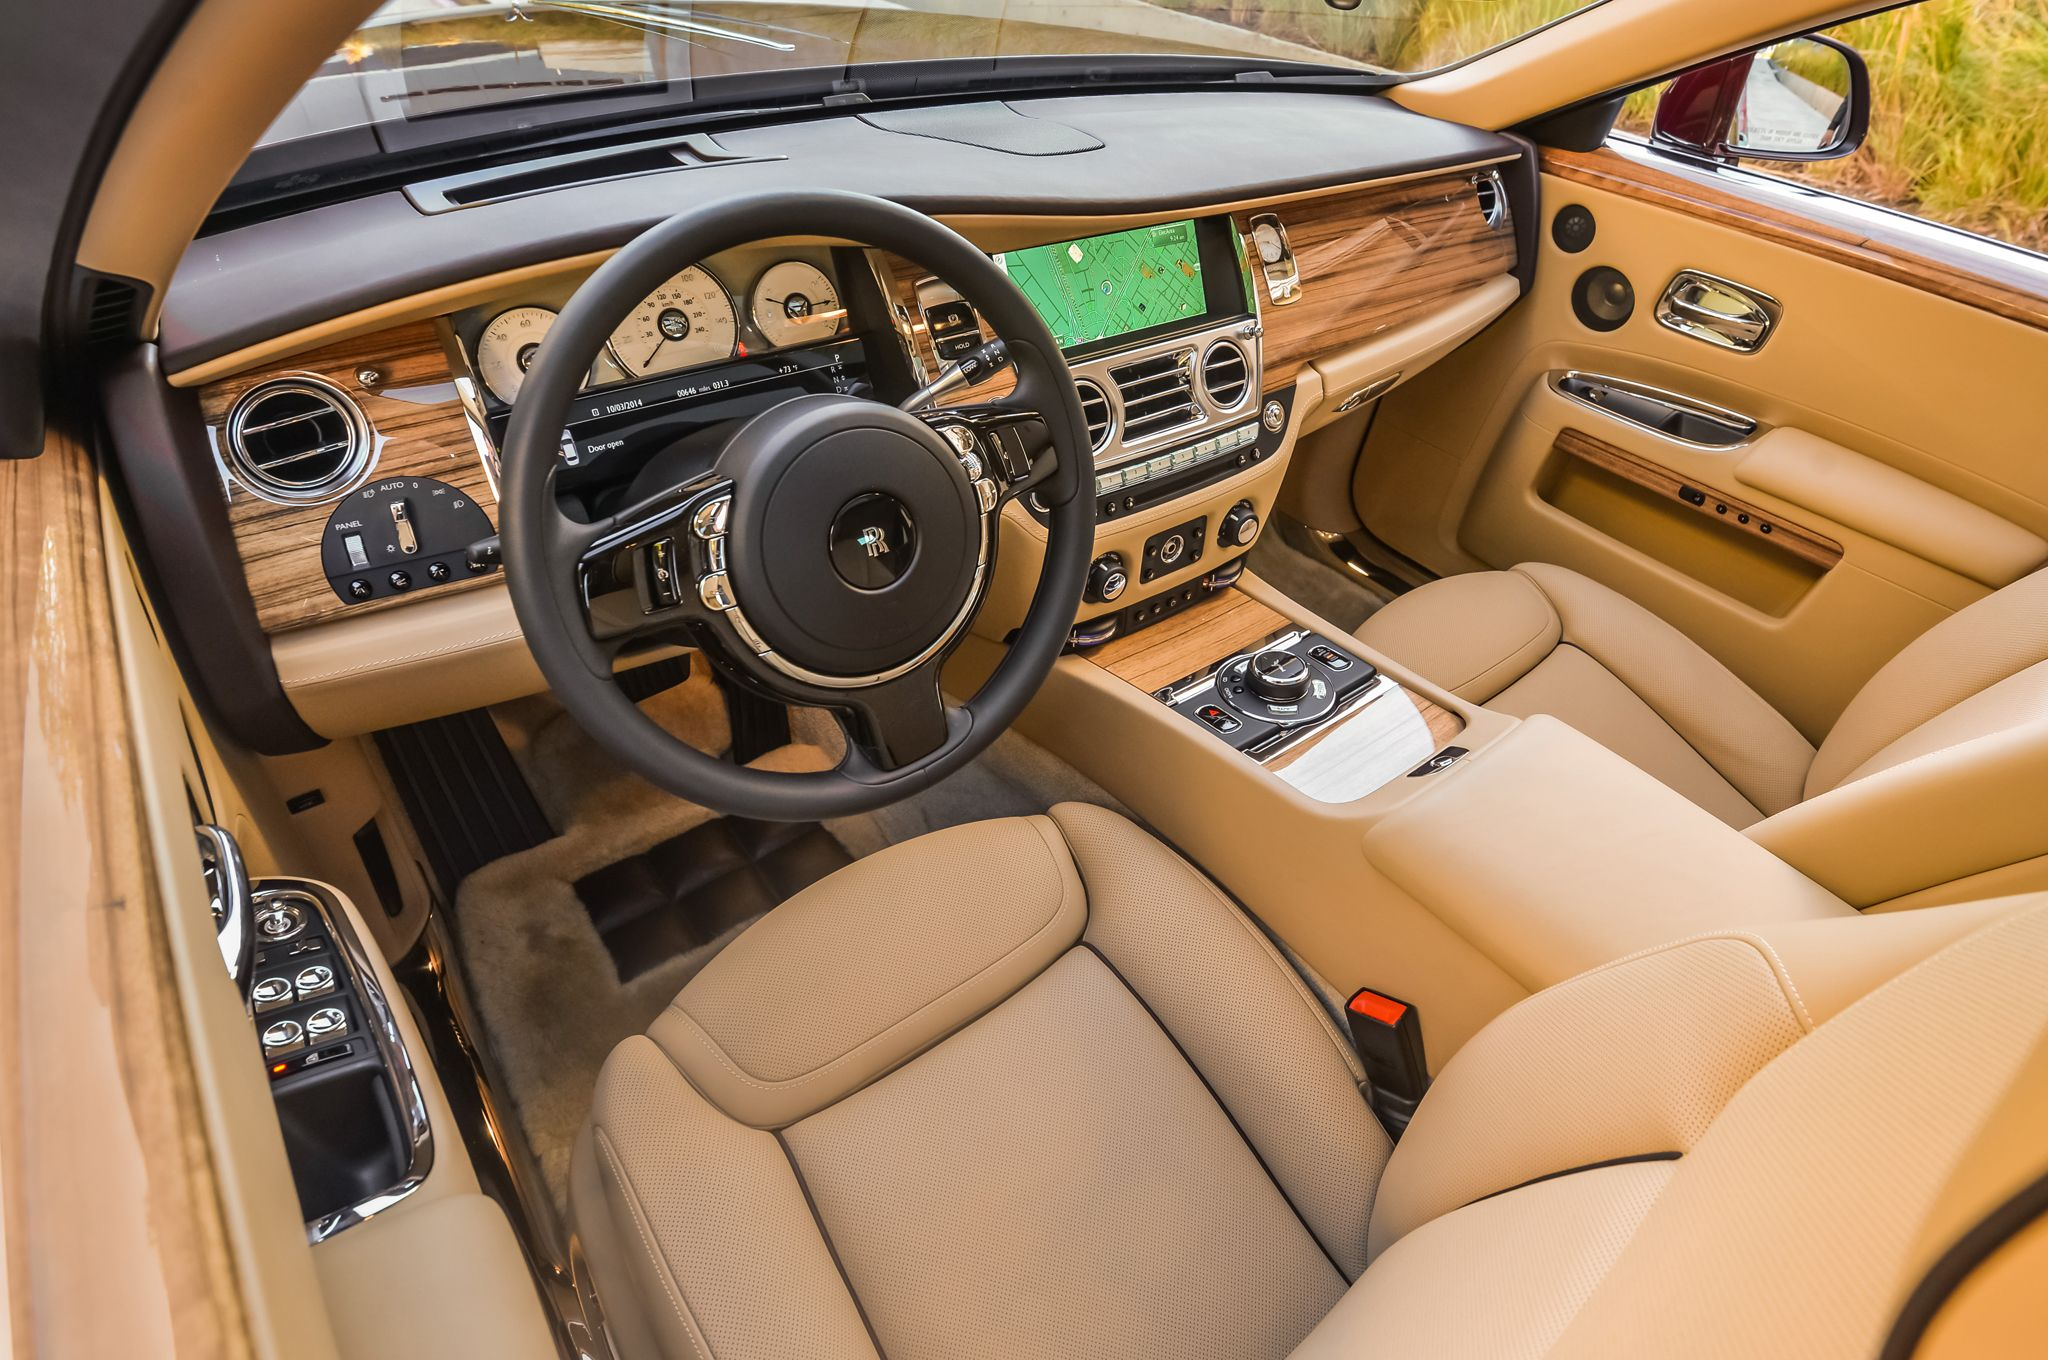 Pin by Xaqib Xomal on Rolls Royce | Pinterest | Rolls royce, Royce ...